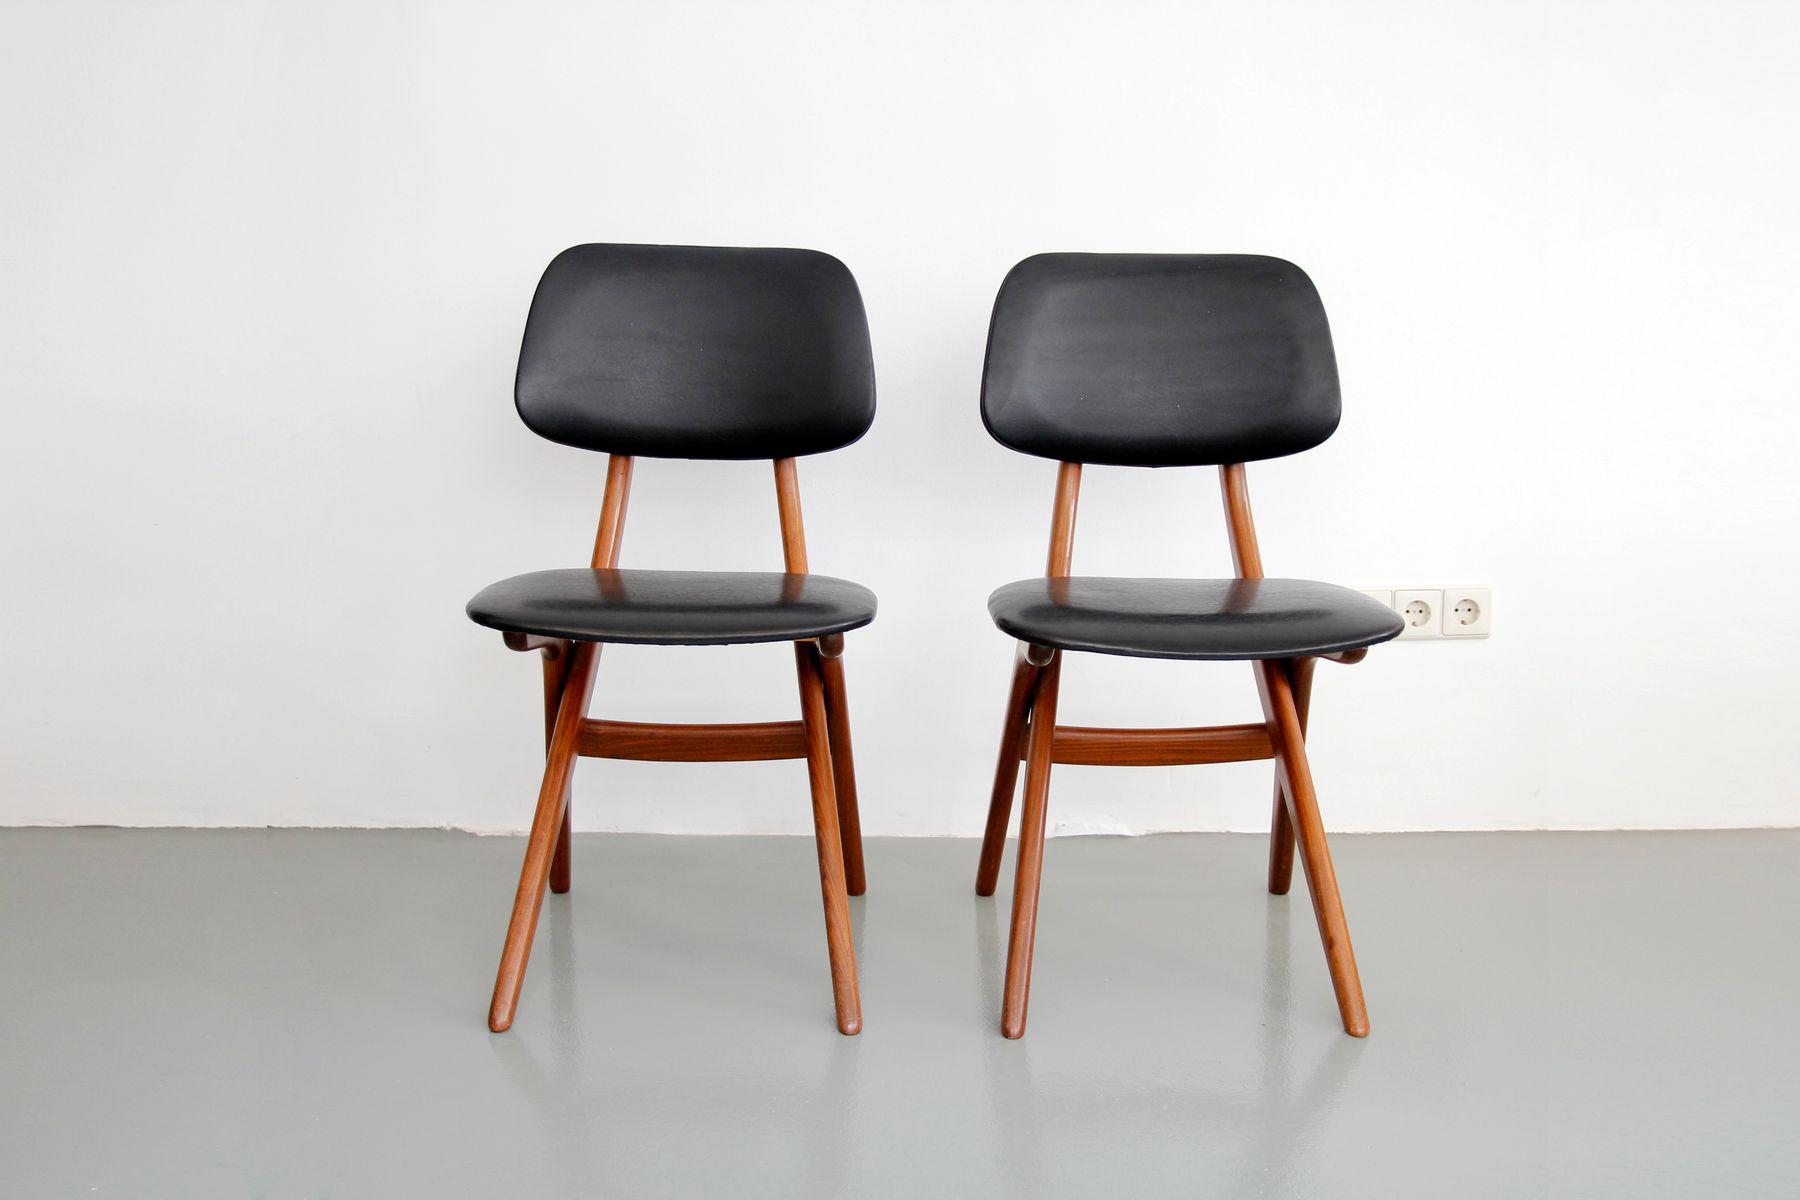 Midcentury Teak Side Chairs by Louis van Teeffelen for  : midcentury teak side chairs by louis van teeffelen for webe set of 2 2 from www.pamono.co.uk size 1800 x 1200 jpeg 68kB